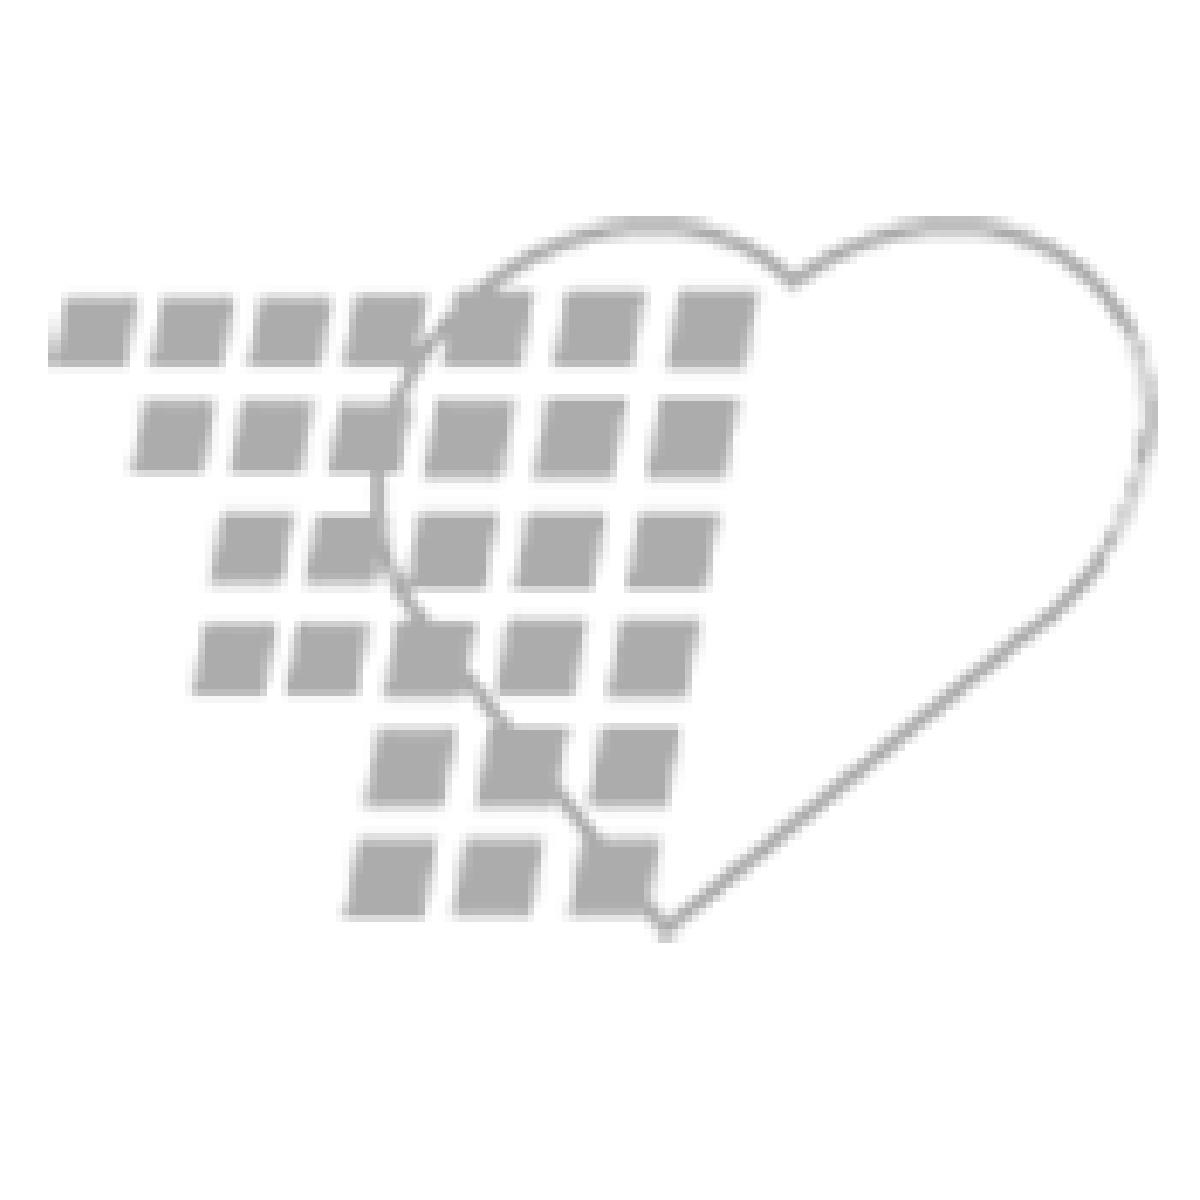 05-44-0400 - Laerdal Stifneck® Short Collar Adult